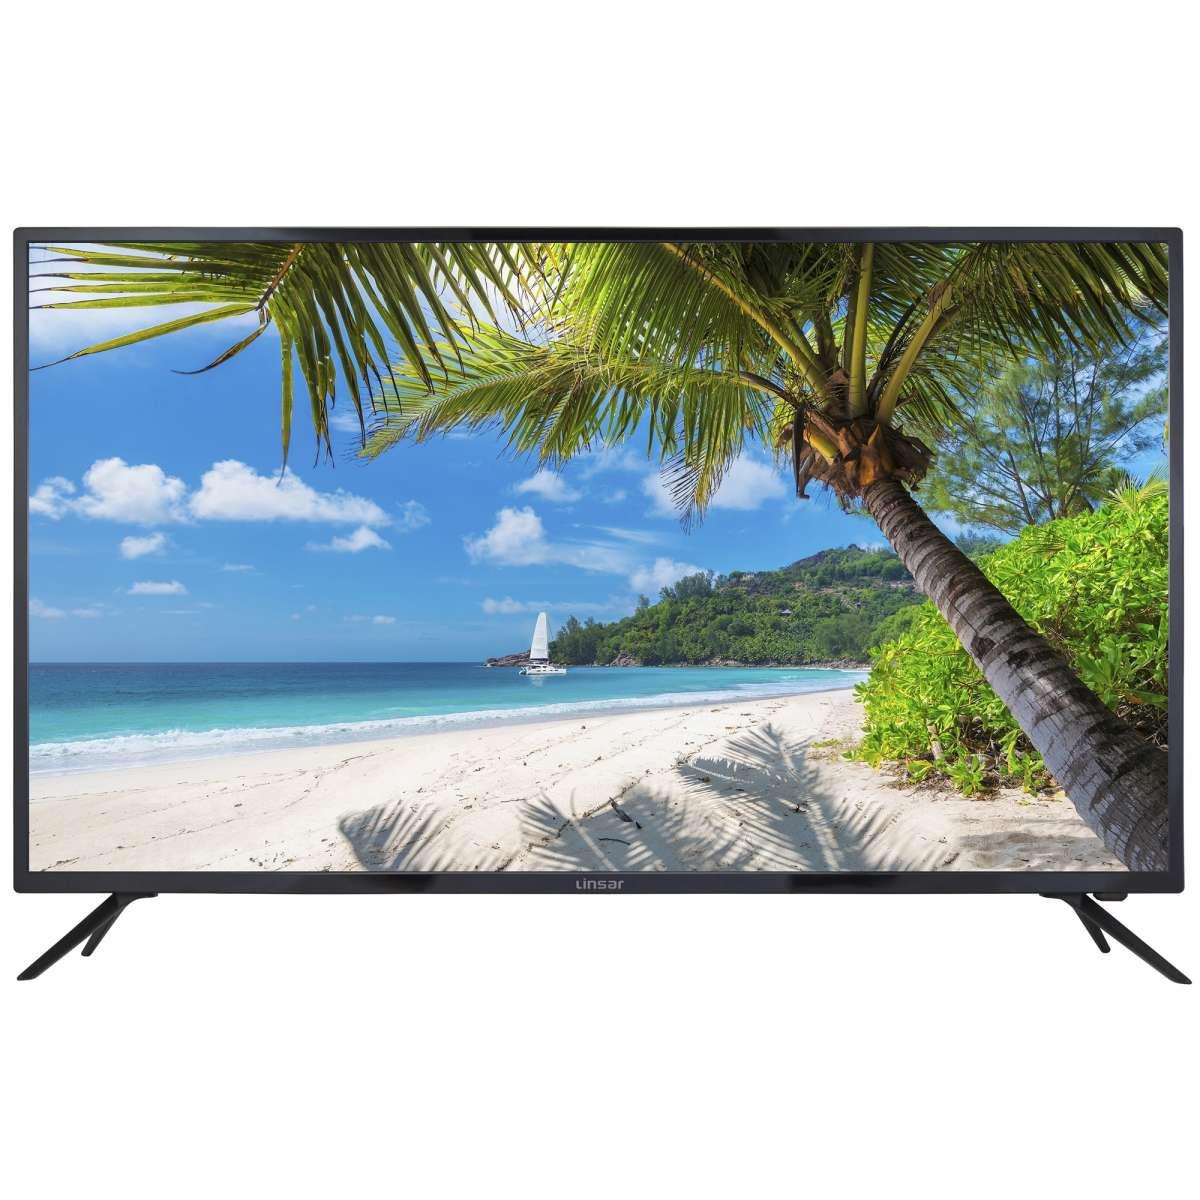 Linsar 4K Ultra HD LED TV + 5 Year Warranty - 50UHD520 50'' £199 / 55UHD520 55'' £299 / 65UHD520 65'' £399 Delivered @ RGB Direct